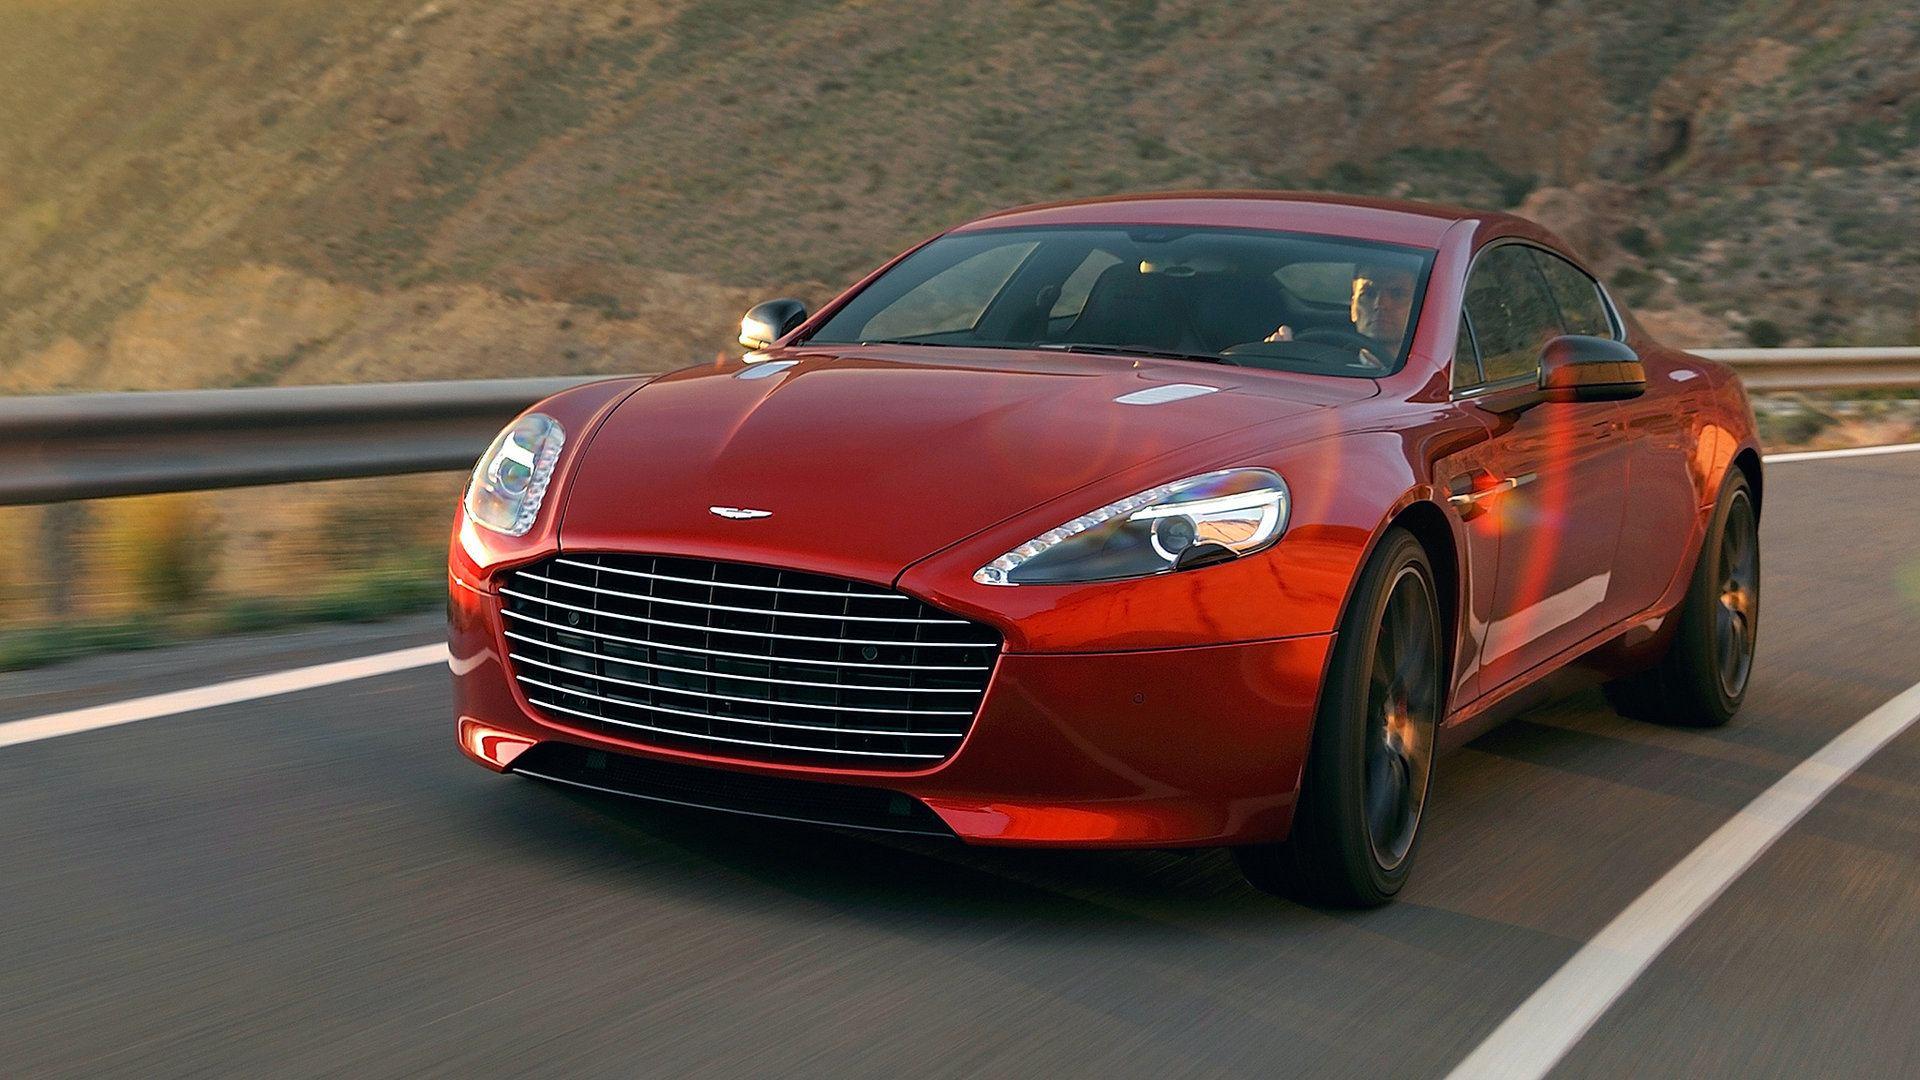 Coche del día: Aston Martin Rapide S